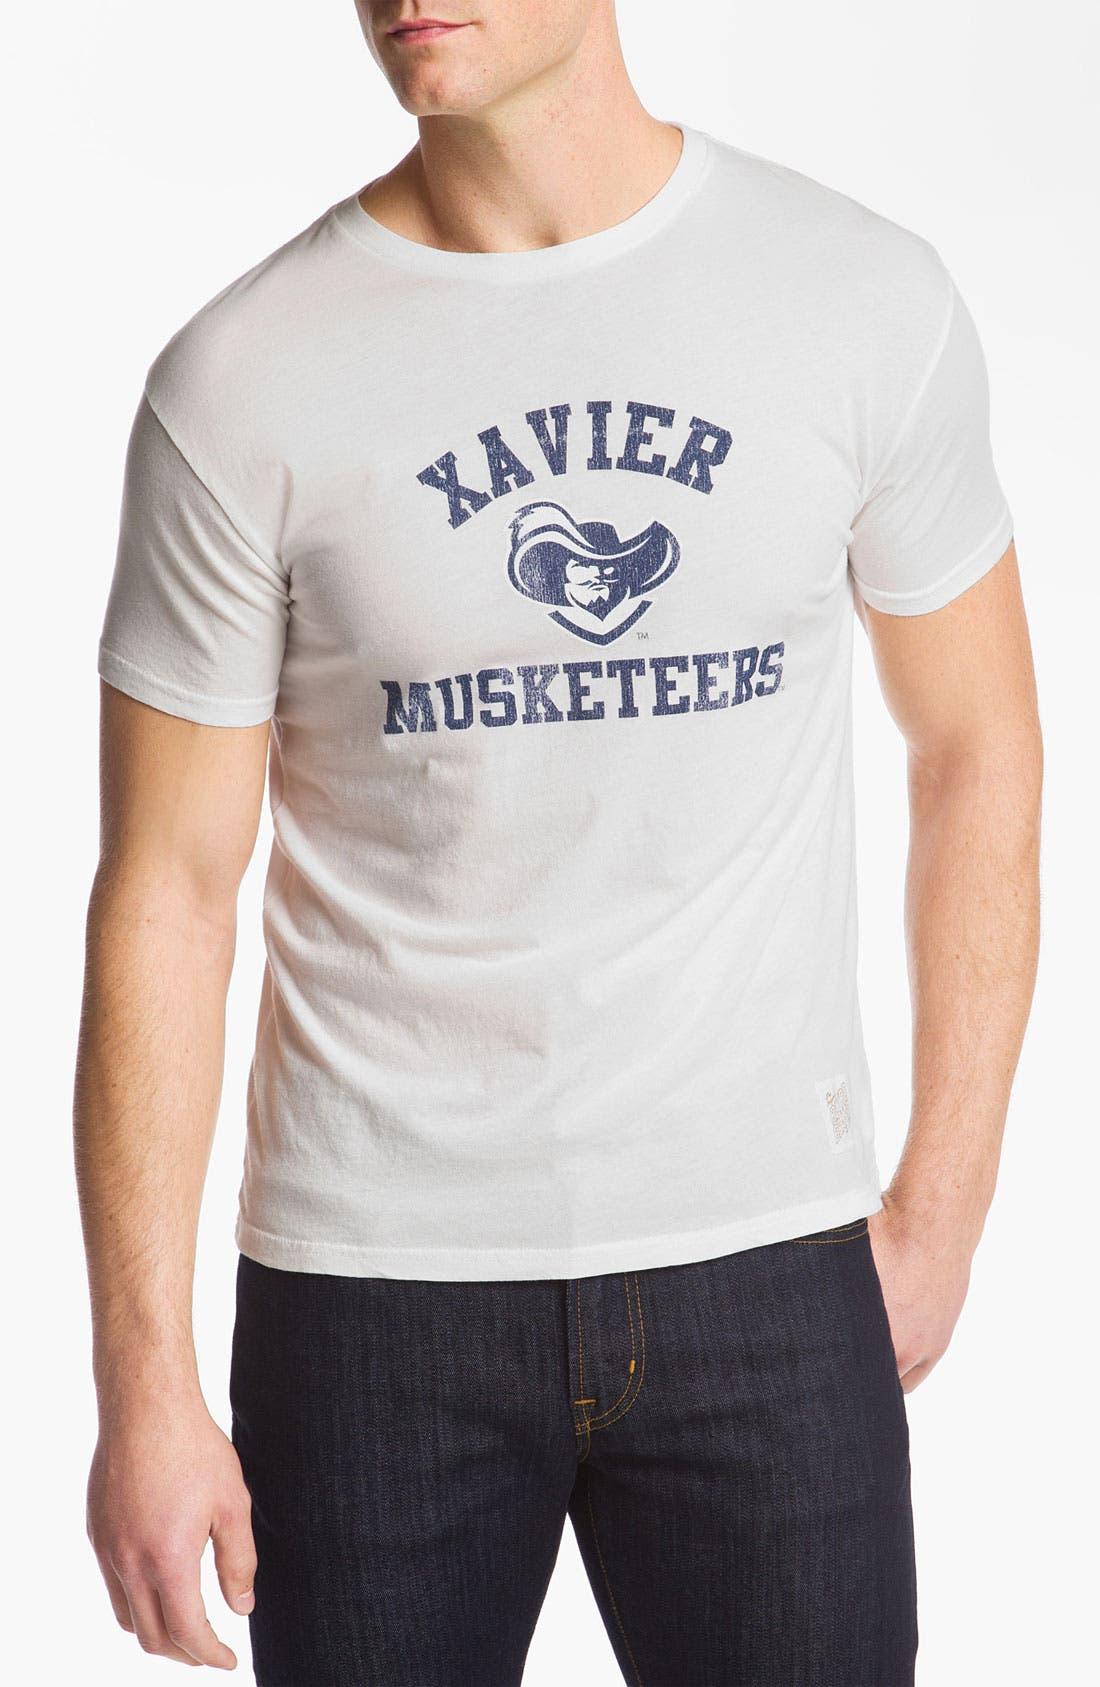 Alternate Image 1 Selected - The Original Retro Brand 'Xavier Musketeers' T-Shirt